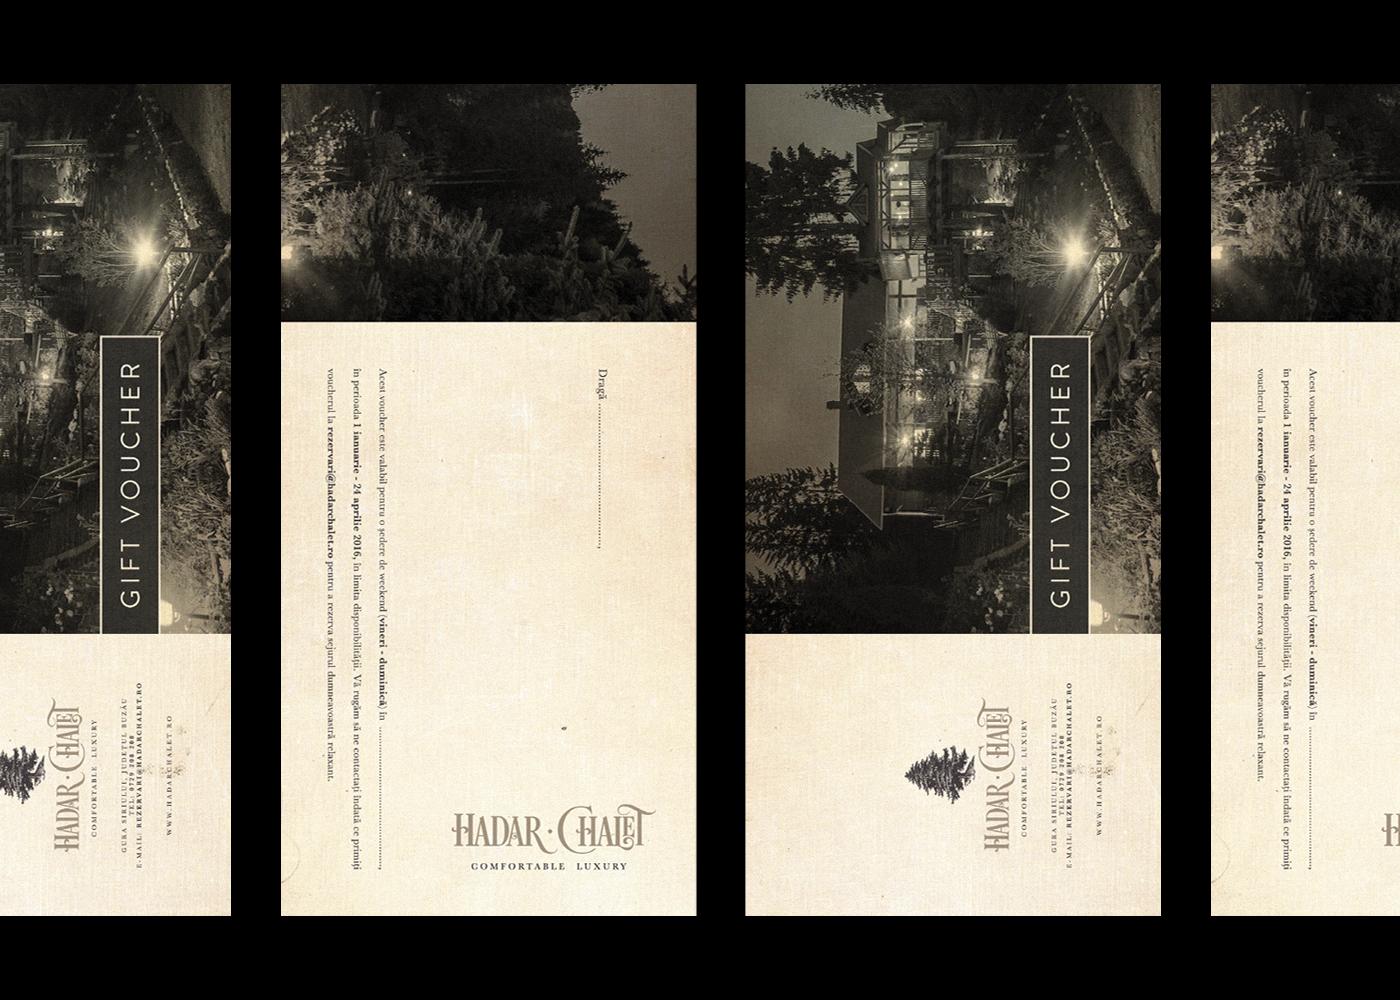 Hadar Chalet Cristi Ursea voucher design fabrik letterpress handpress